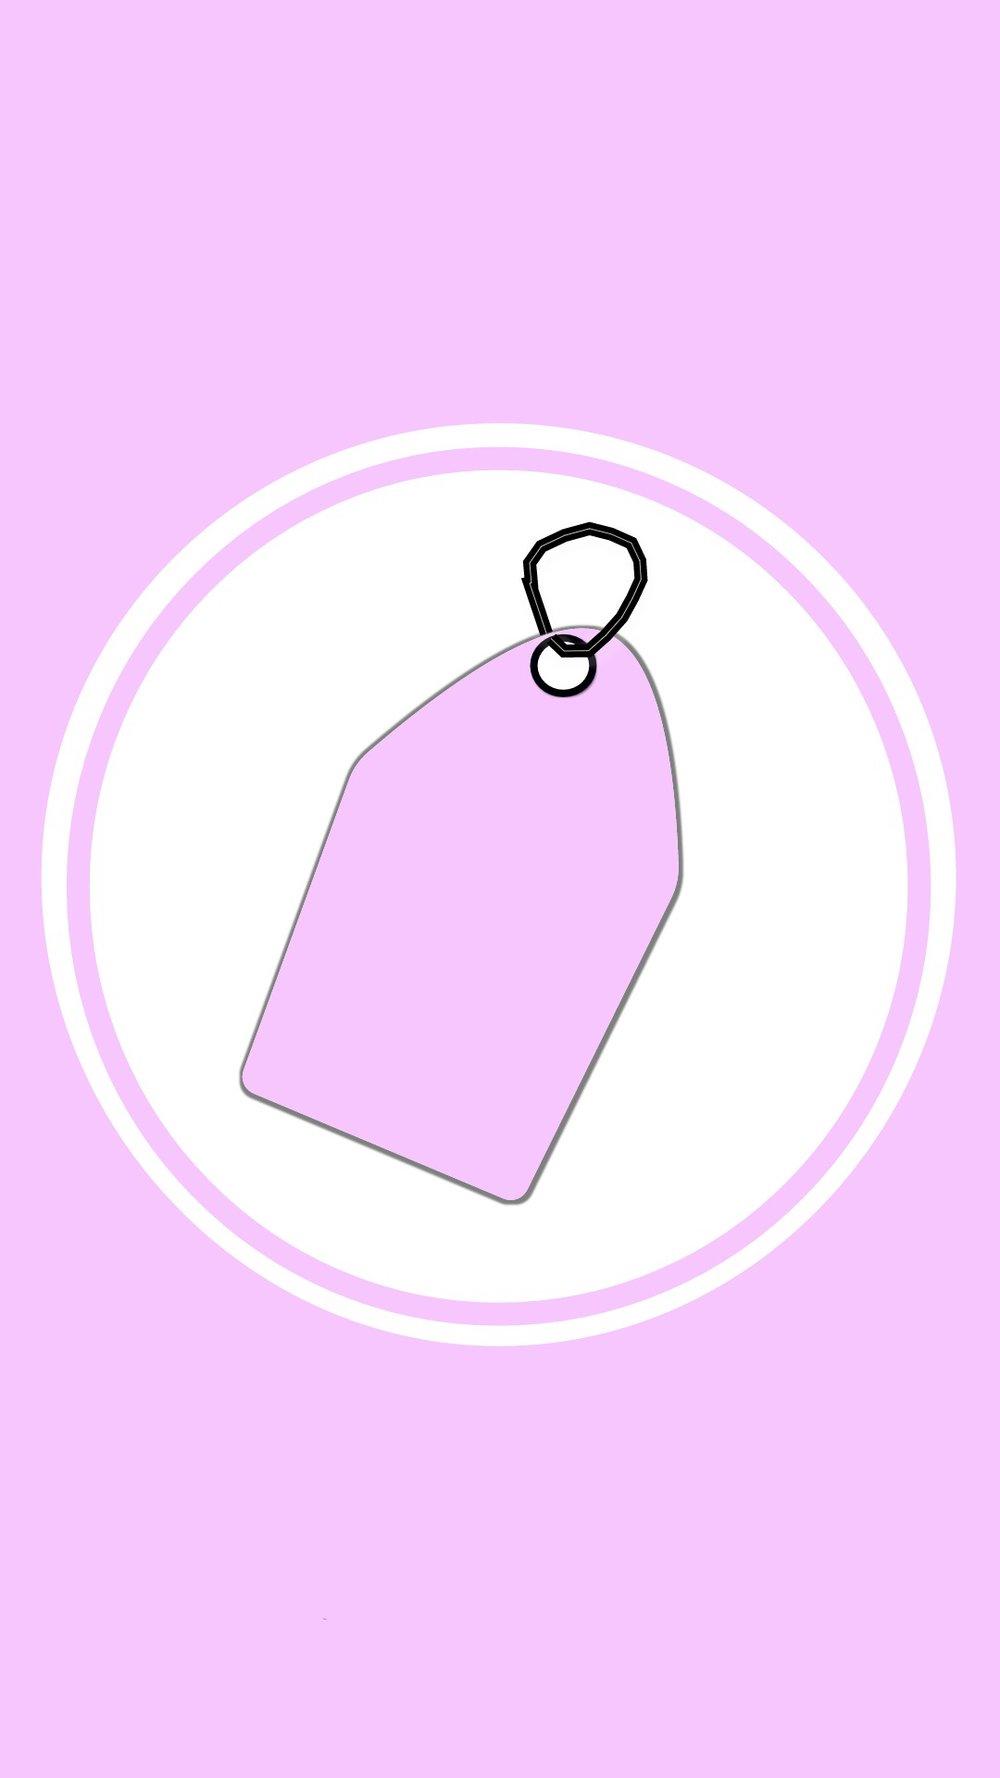 Instagram-cover-tag-pink-lotnotes.com.jpg